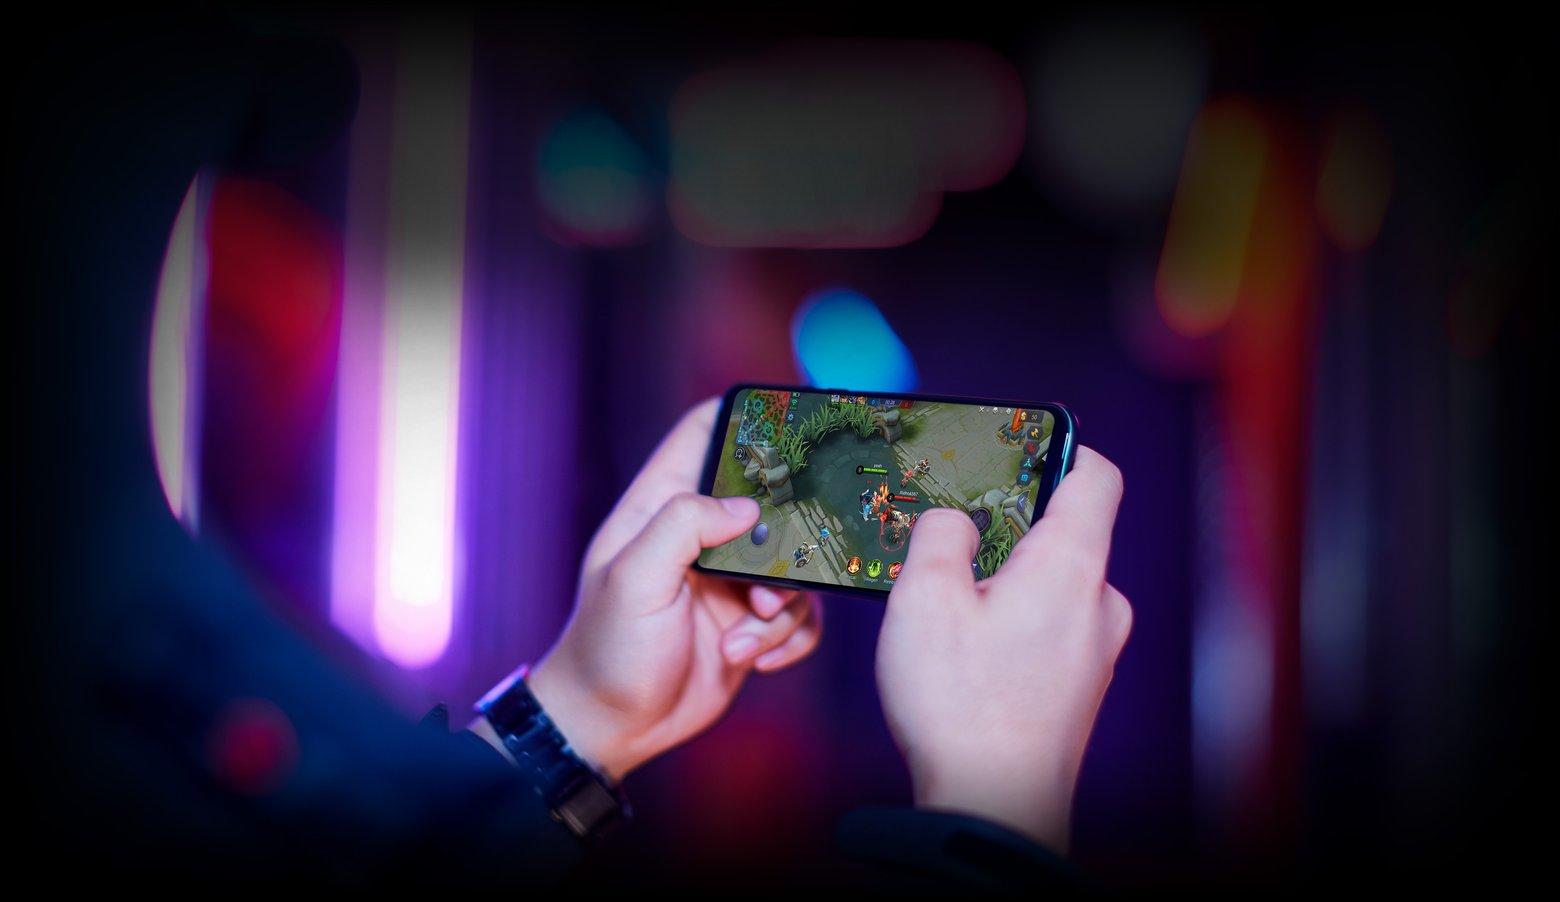 Review Black Shark 2 Pro: Ponsel Gaming Super Kencang dengan Desain Futuristik 21 android, Black Shark, Black Shark 2 Pro, review